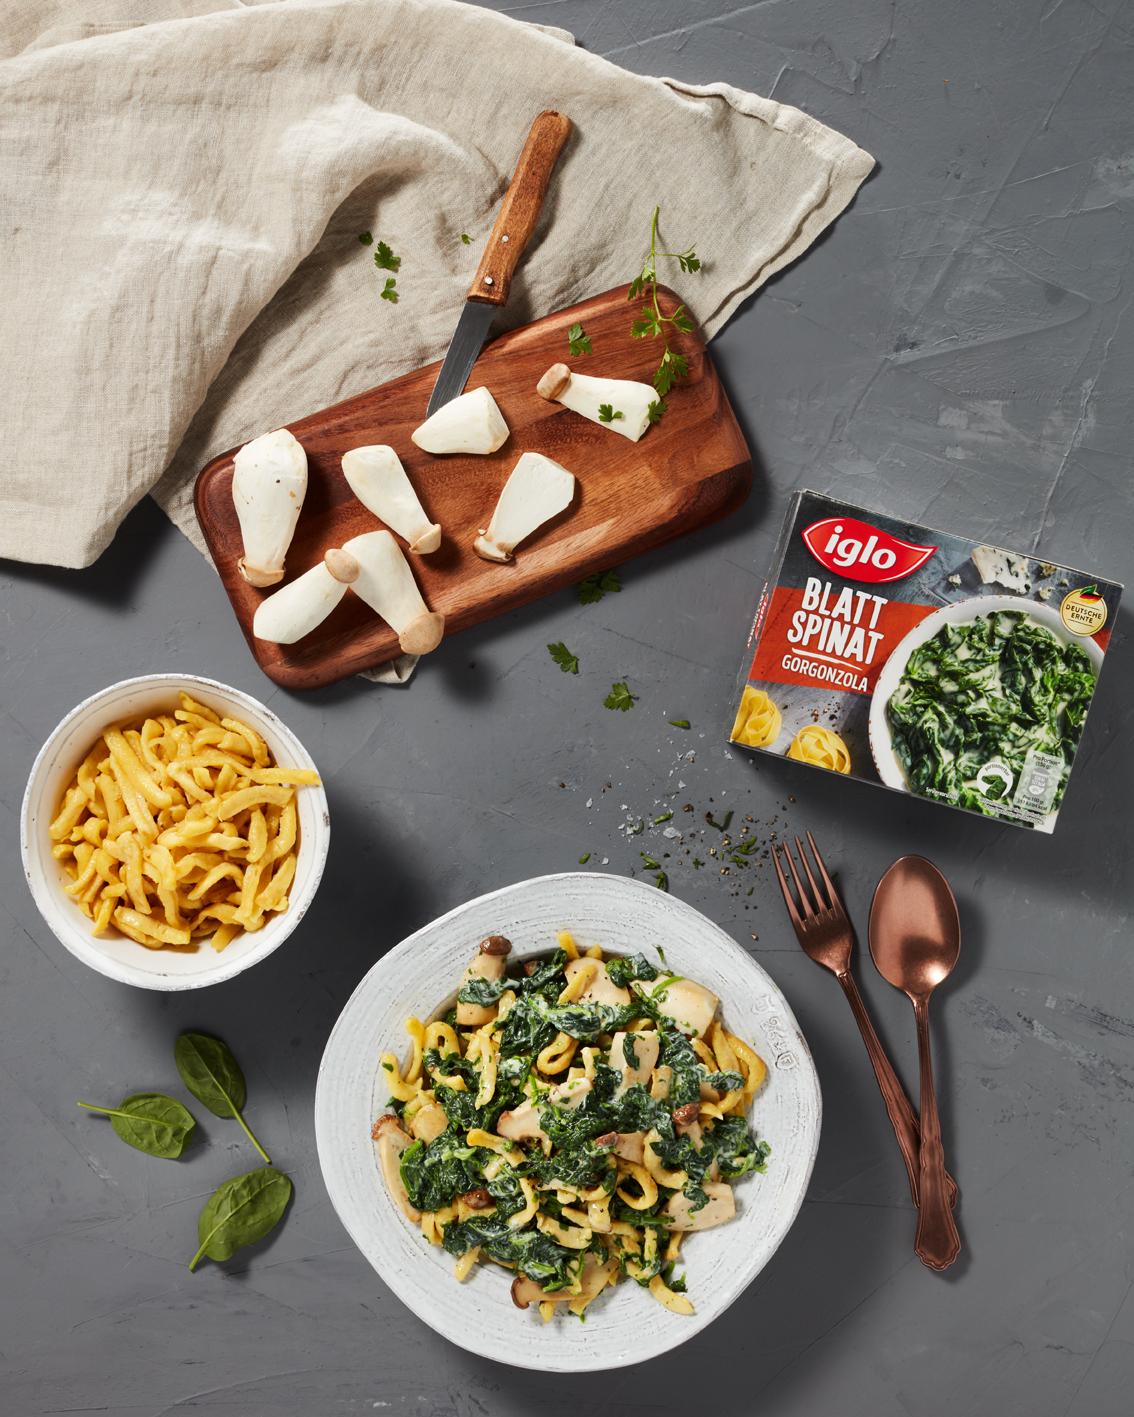 Food, Food-fotografie, Iglo, 3 Zutatenküche, Still-life, Hamburg, Christopher Shaw, Spinat, Pasta, Spätzle, Pilze, Topshot